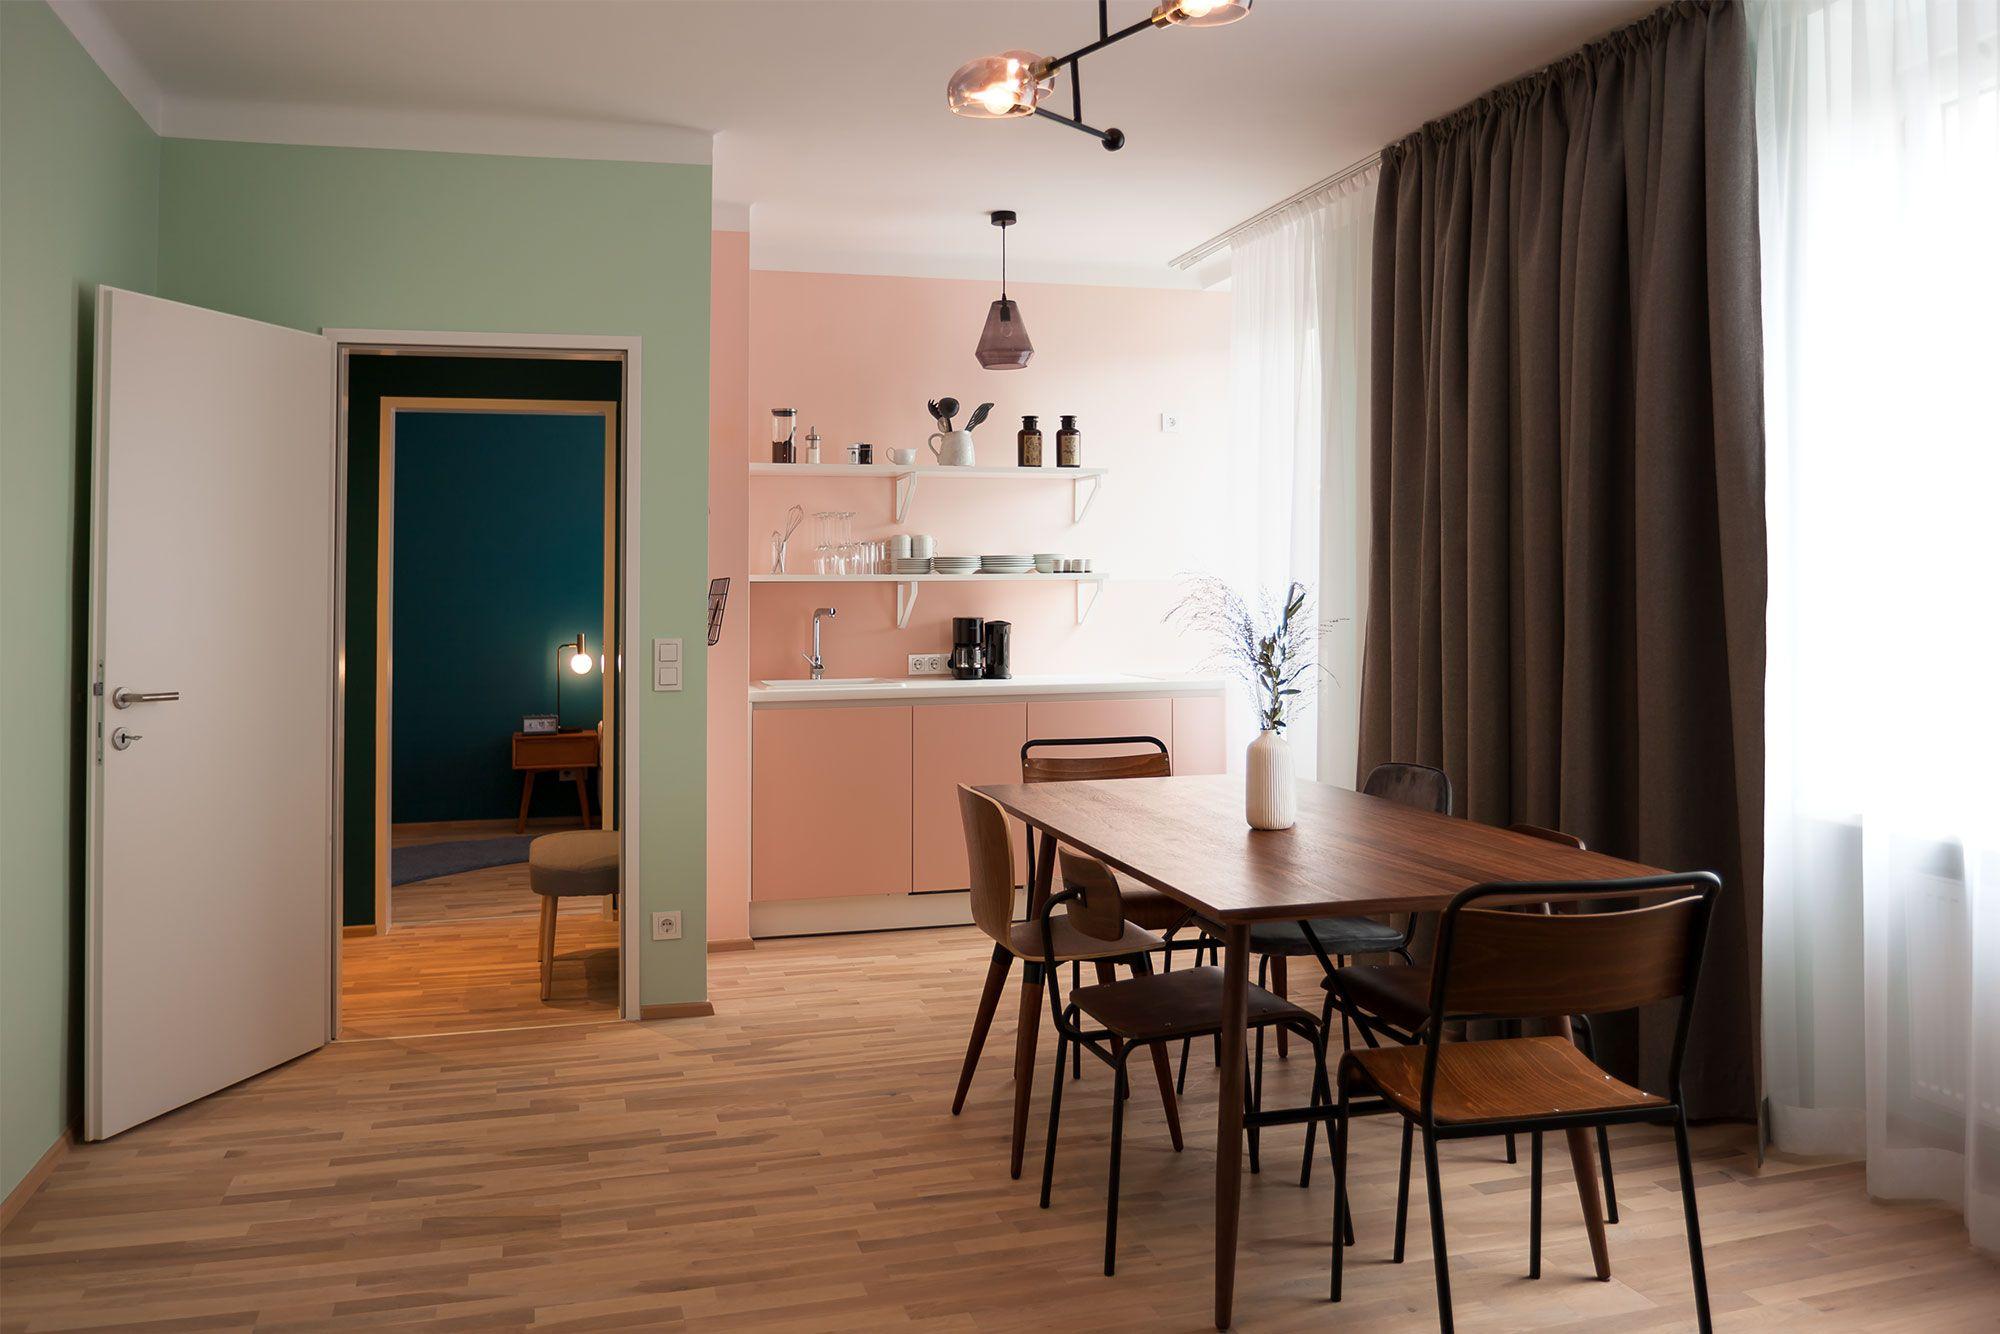 Apartment Large Belvedere in Wien etagerie Wohnung